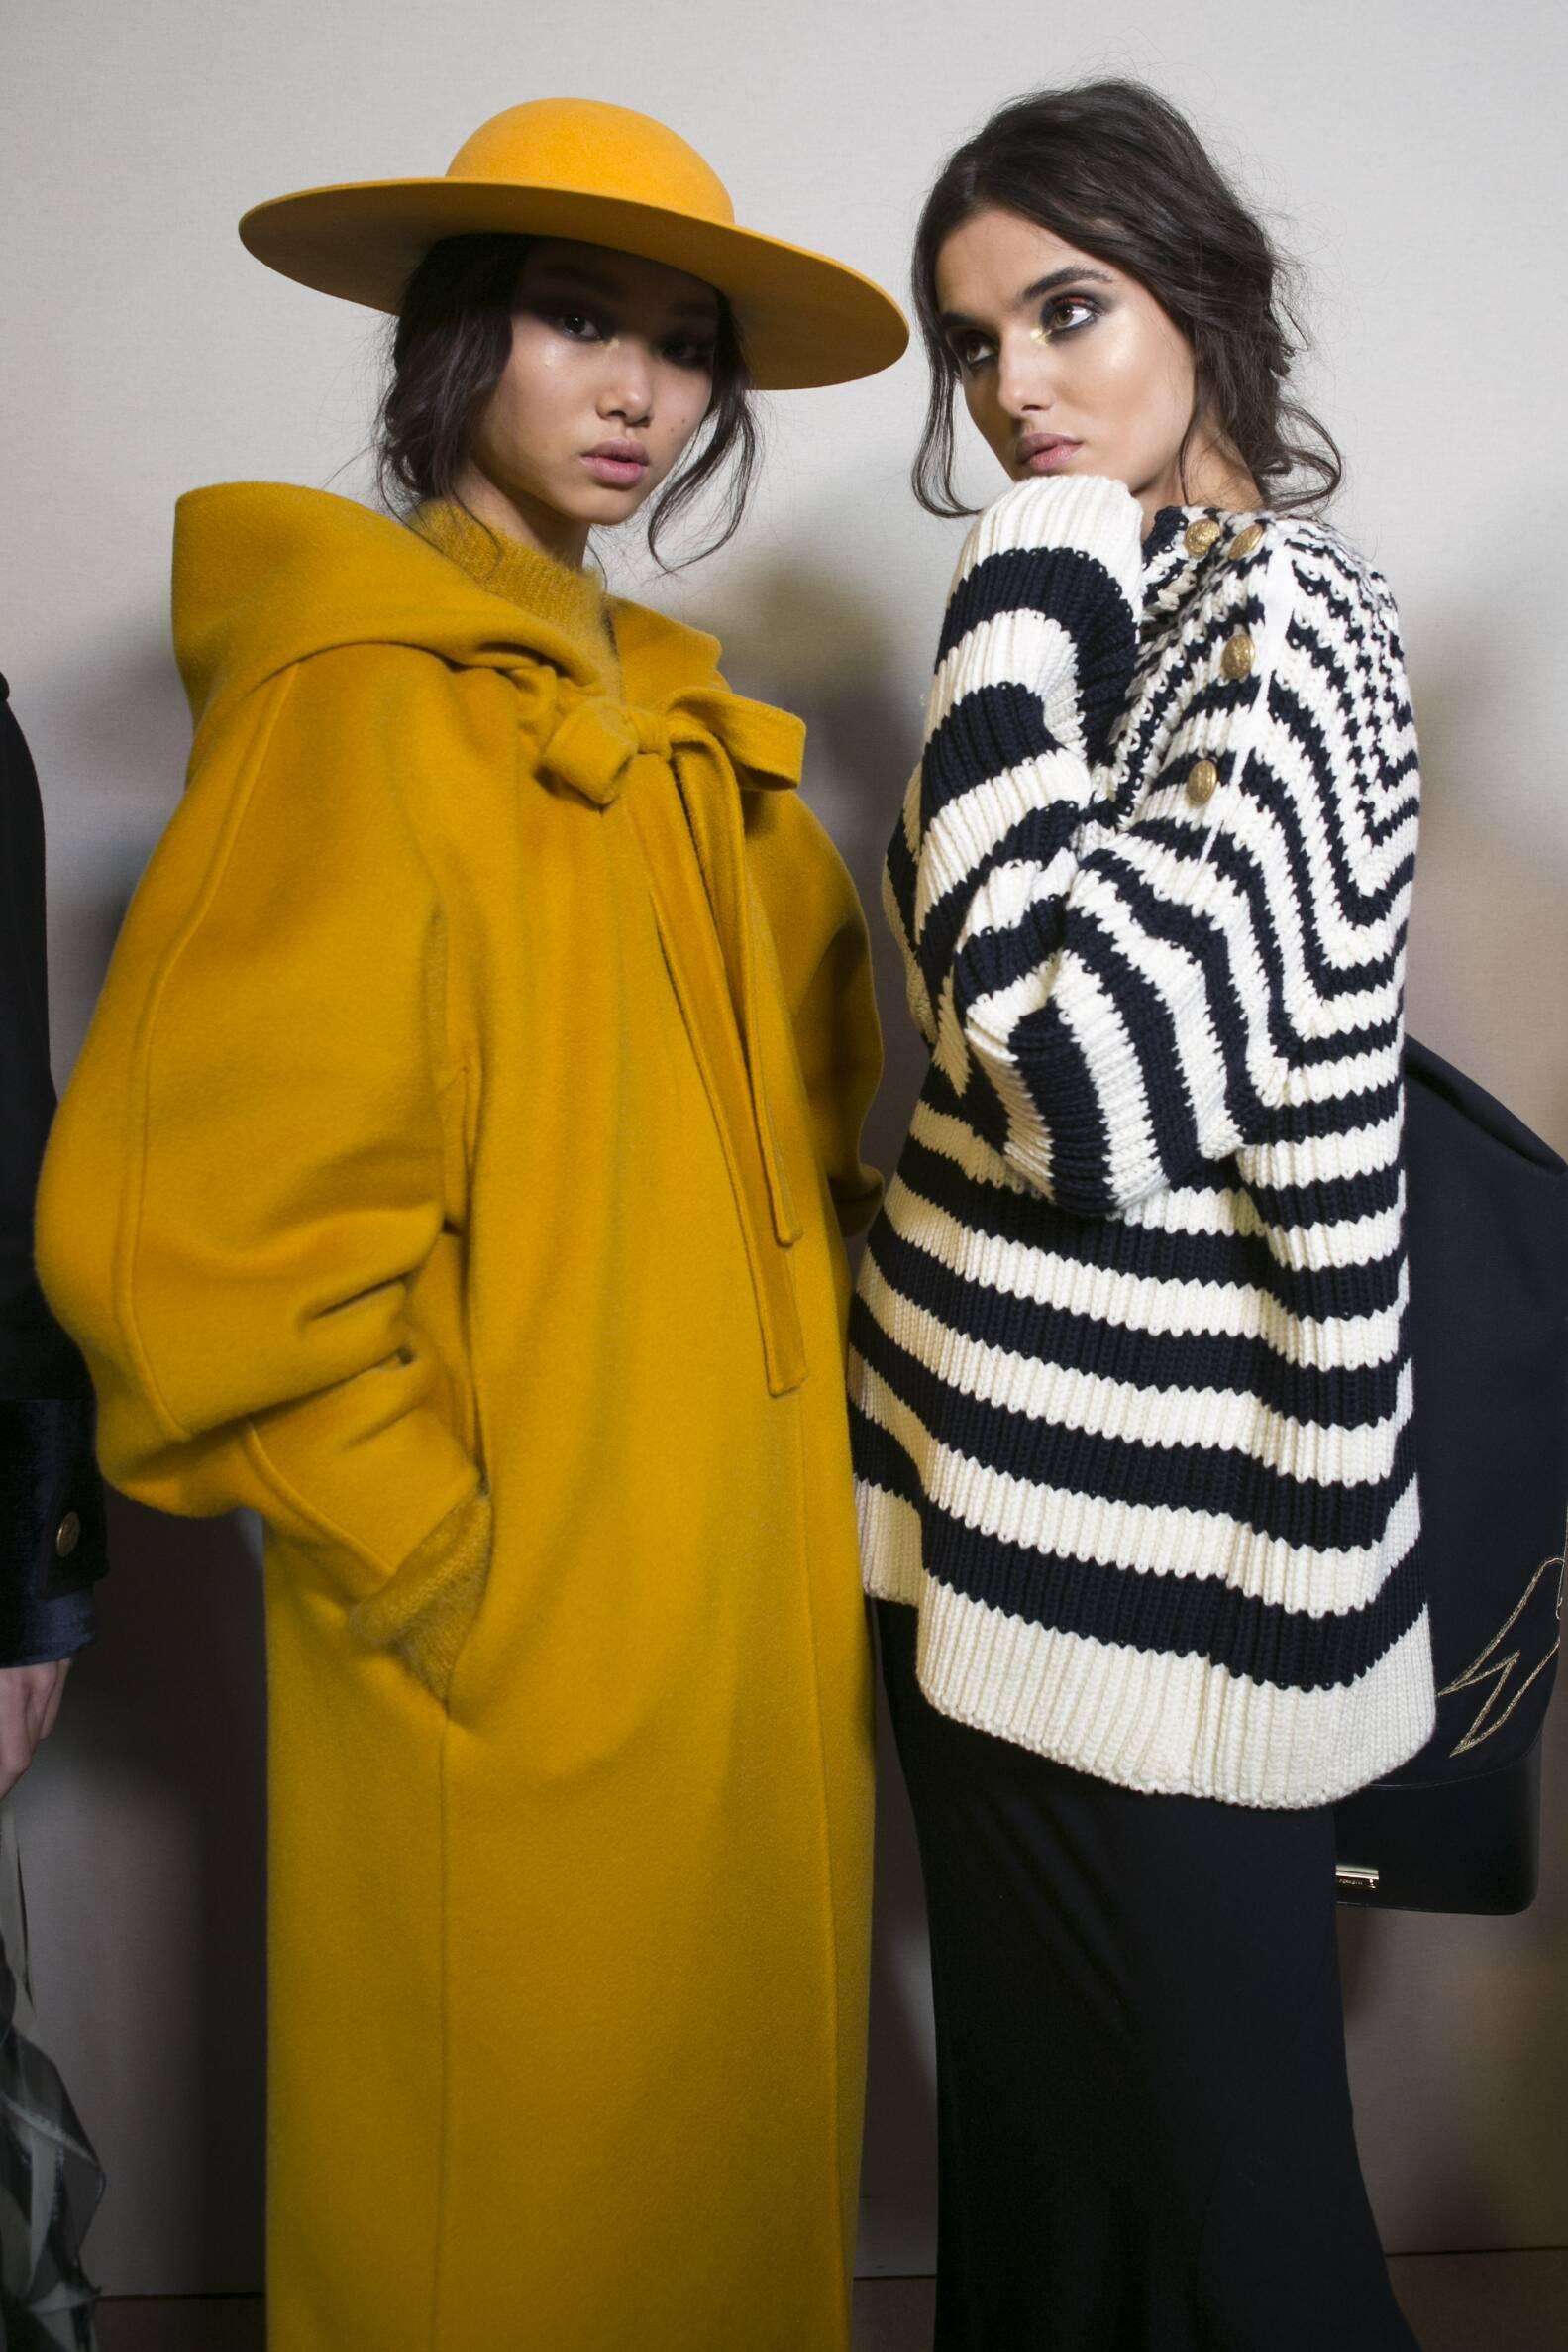 Backstage Alberta Ferretti Models 2017 Womens Collection Milan Fashion Week